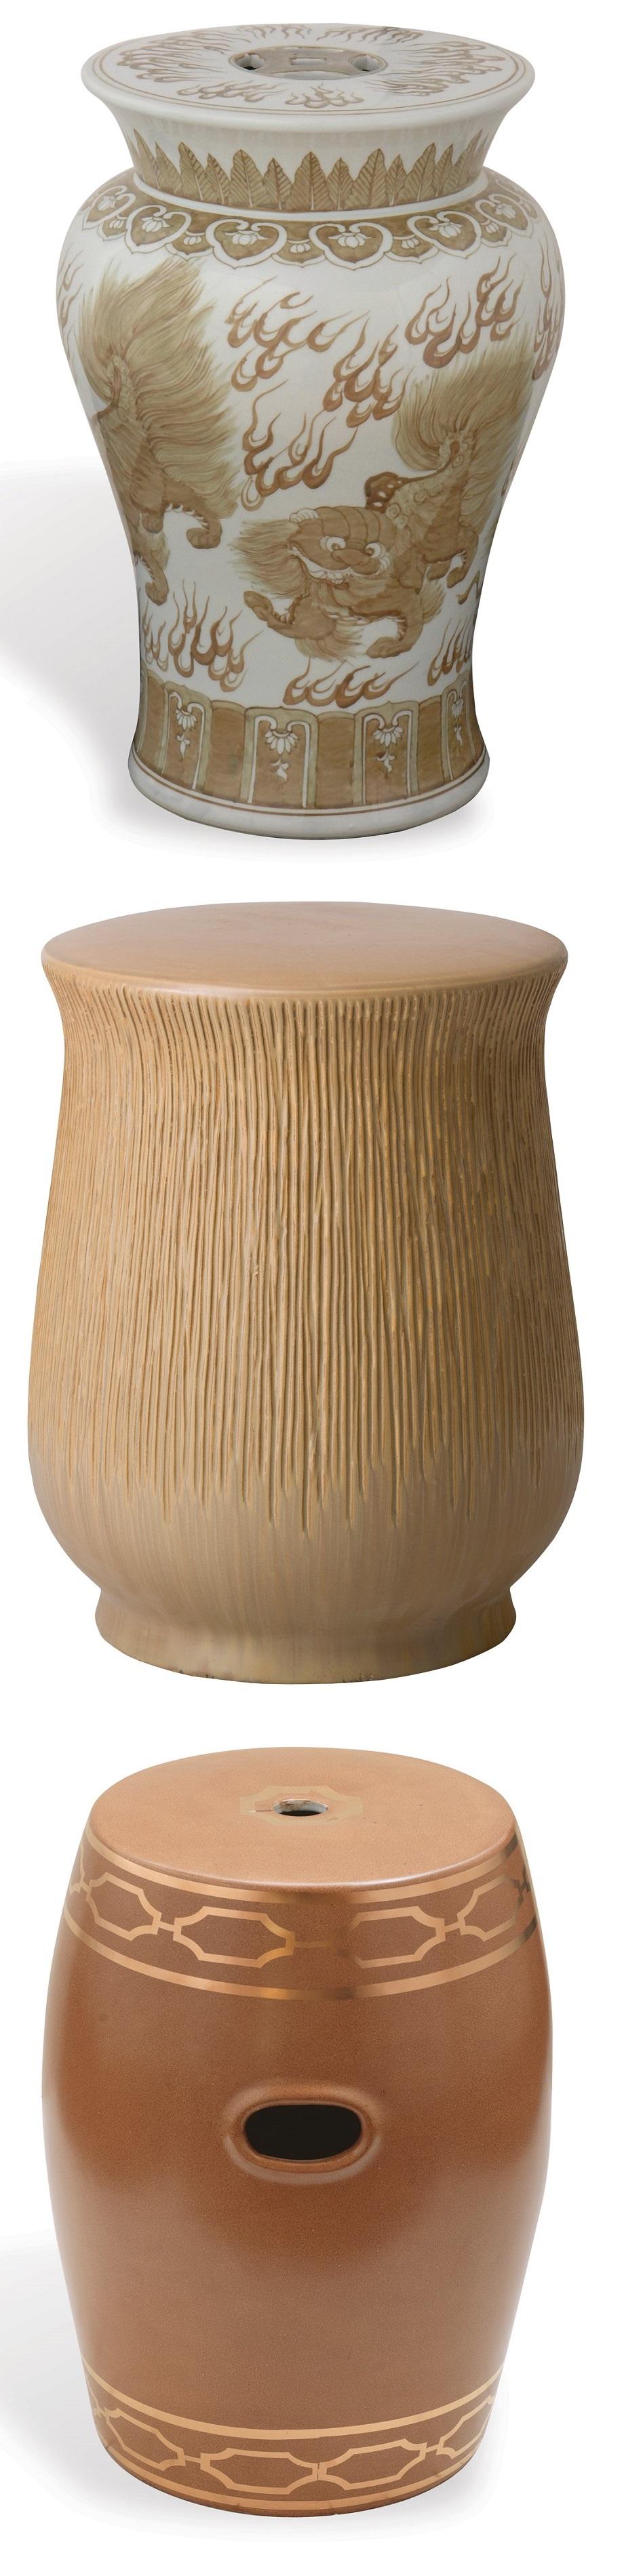 Brown Garden Stool | Brown Ceramic Stools | Brown Porcelain Stool ...